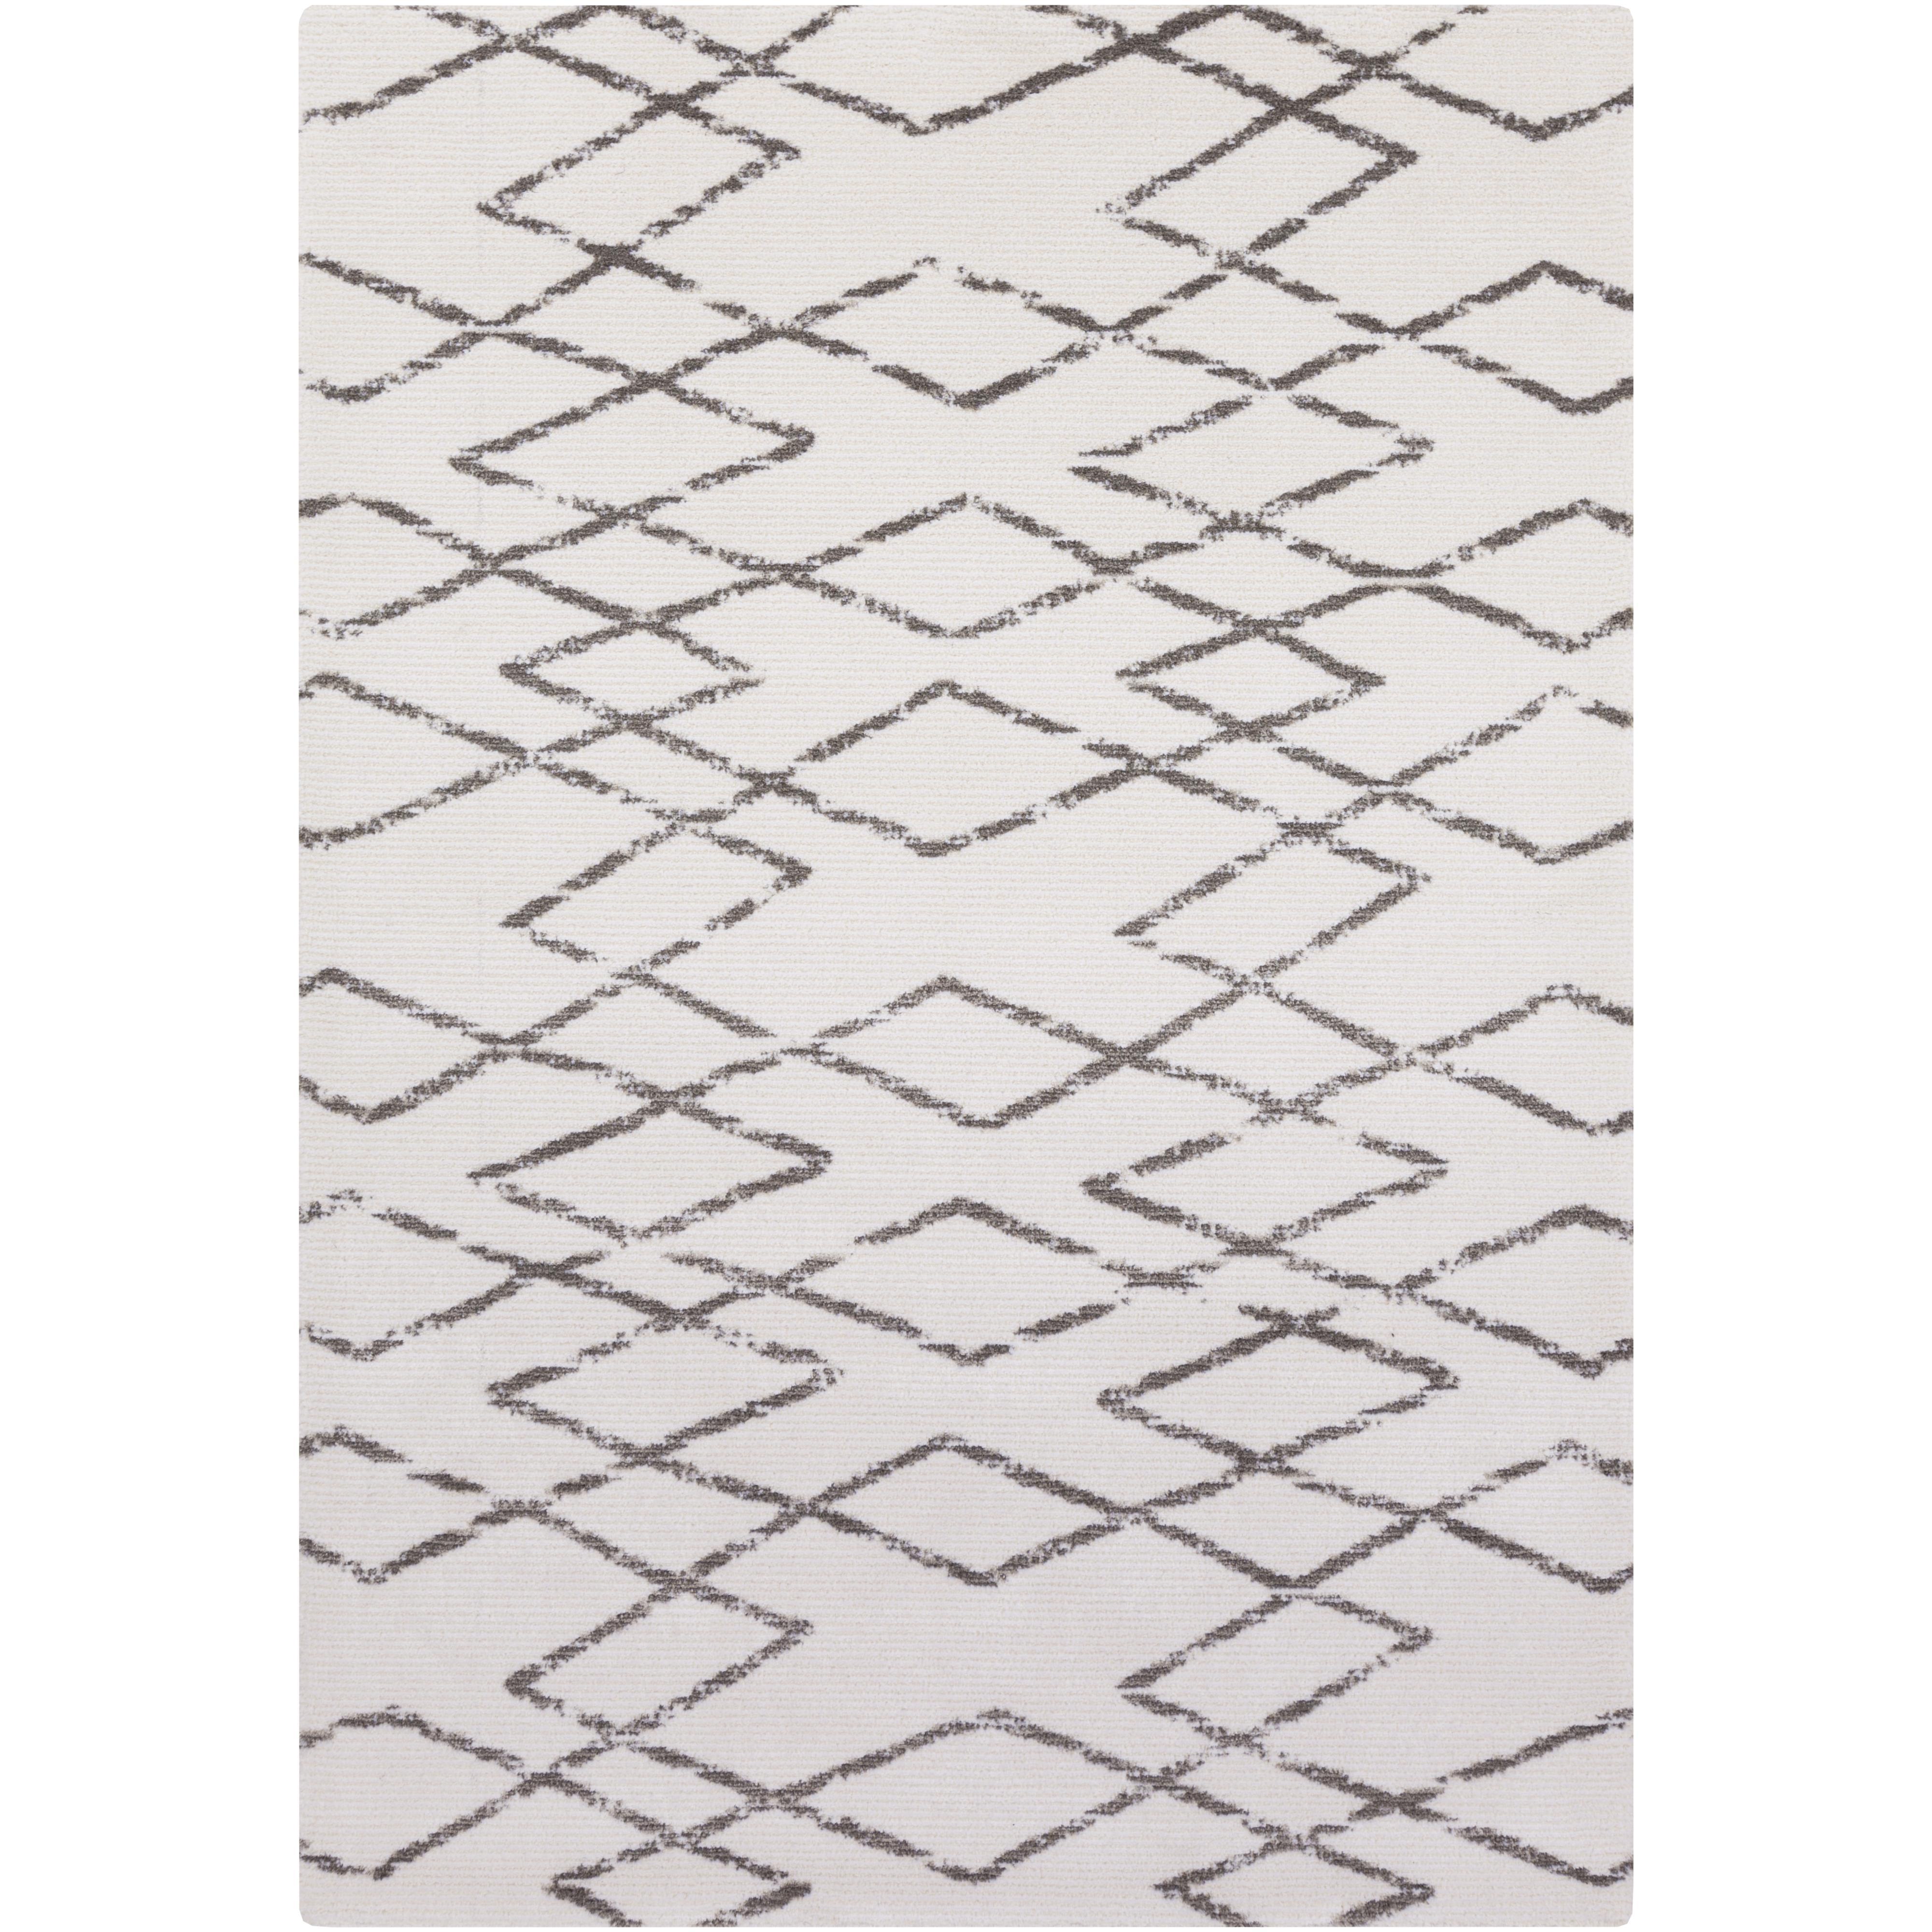 Surya Rugs Perla 5' x 8' - Item Number: PRA6001-58